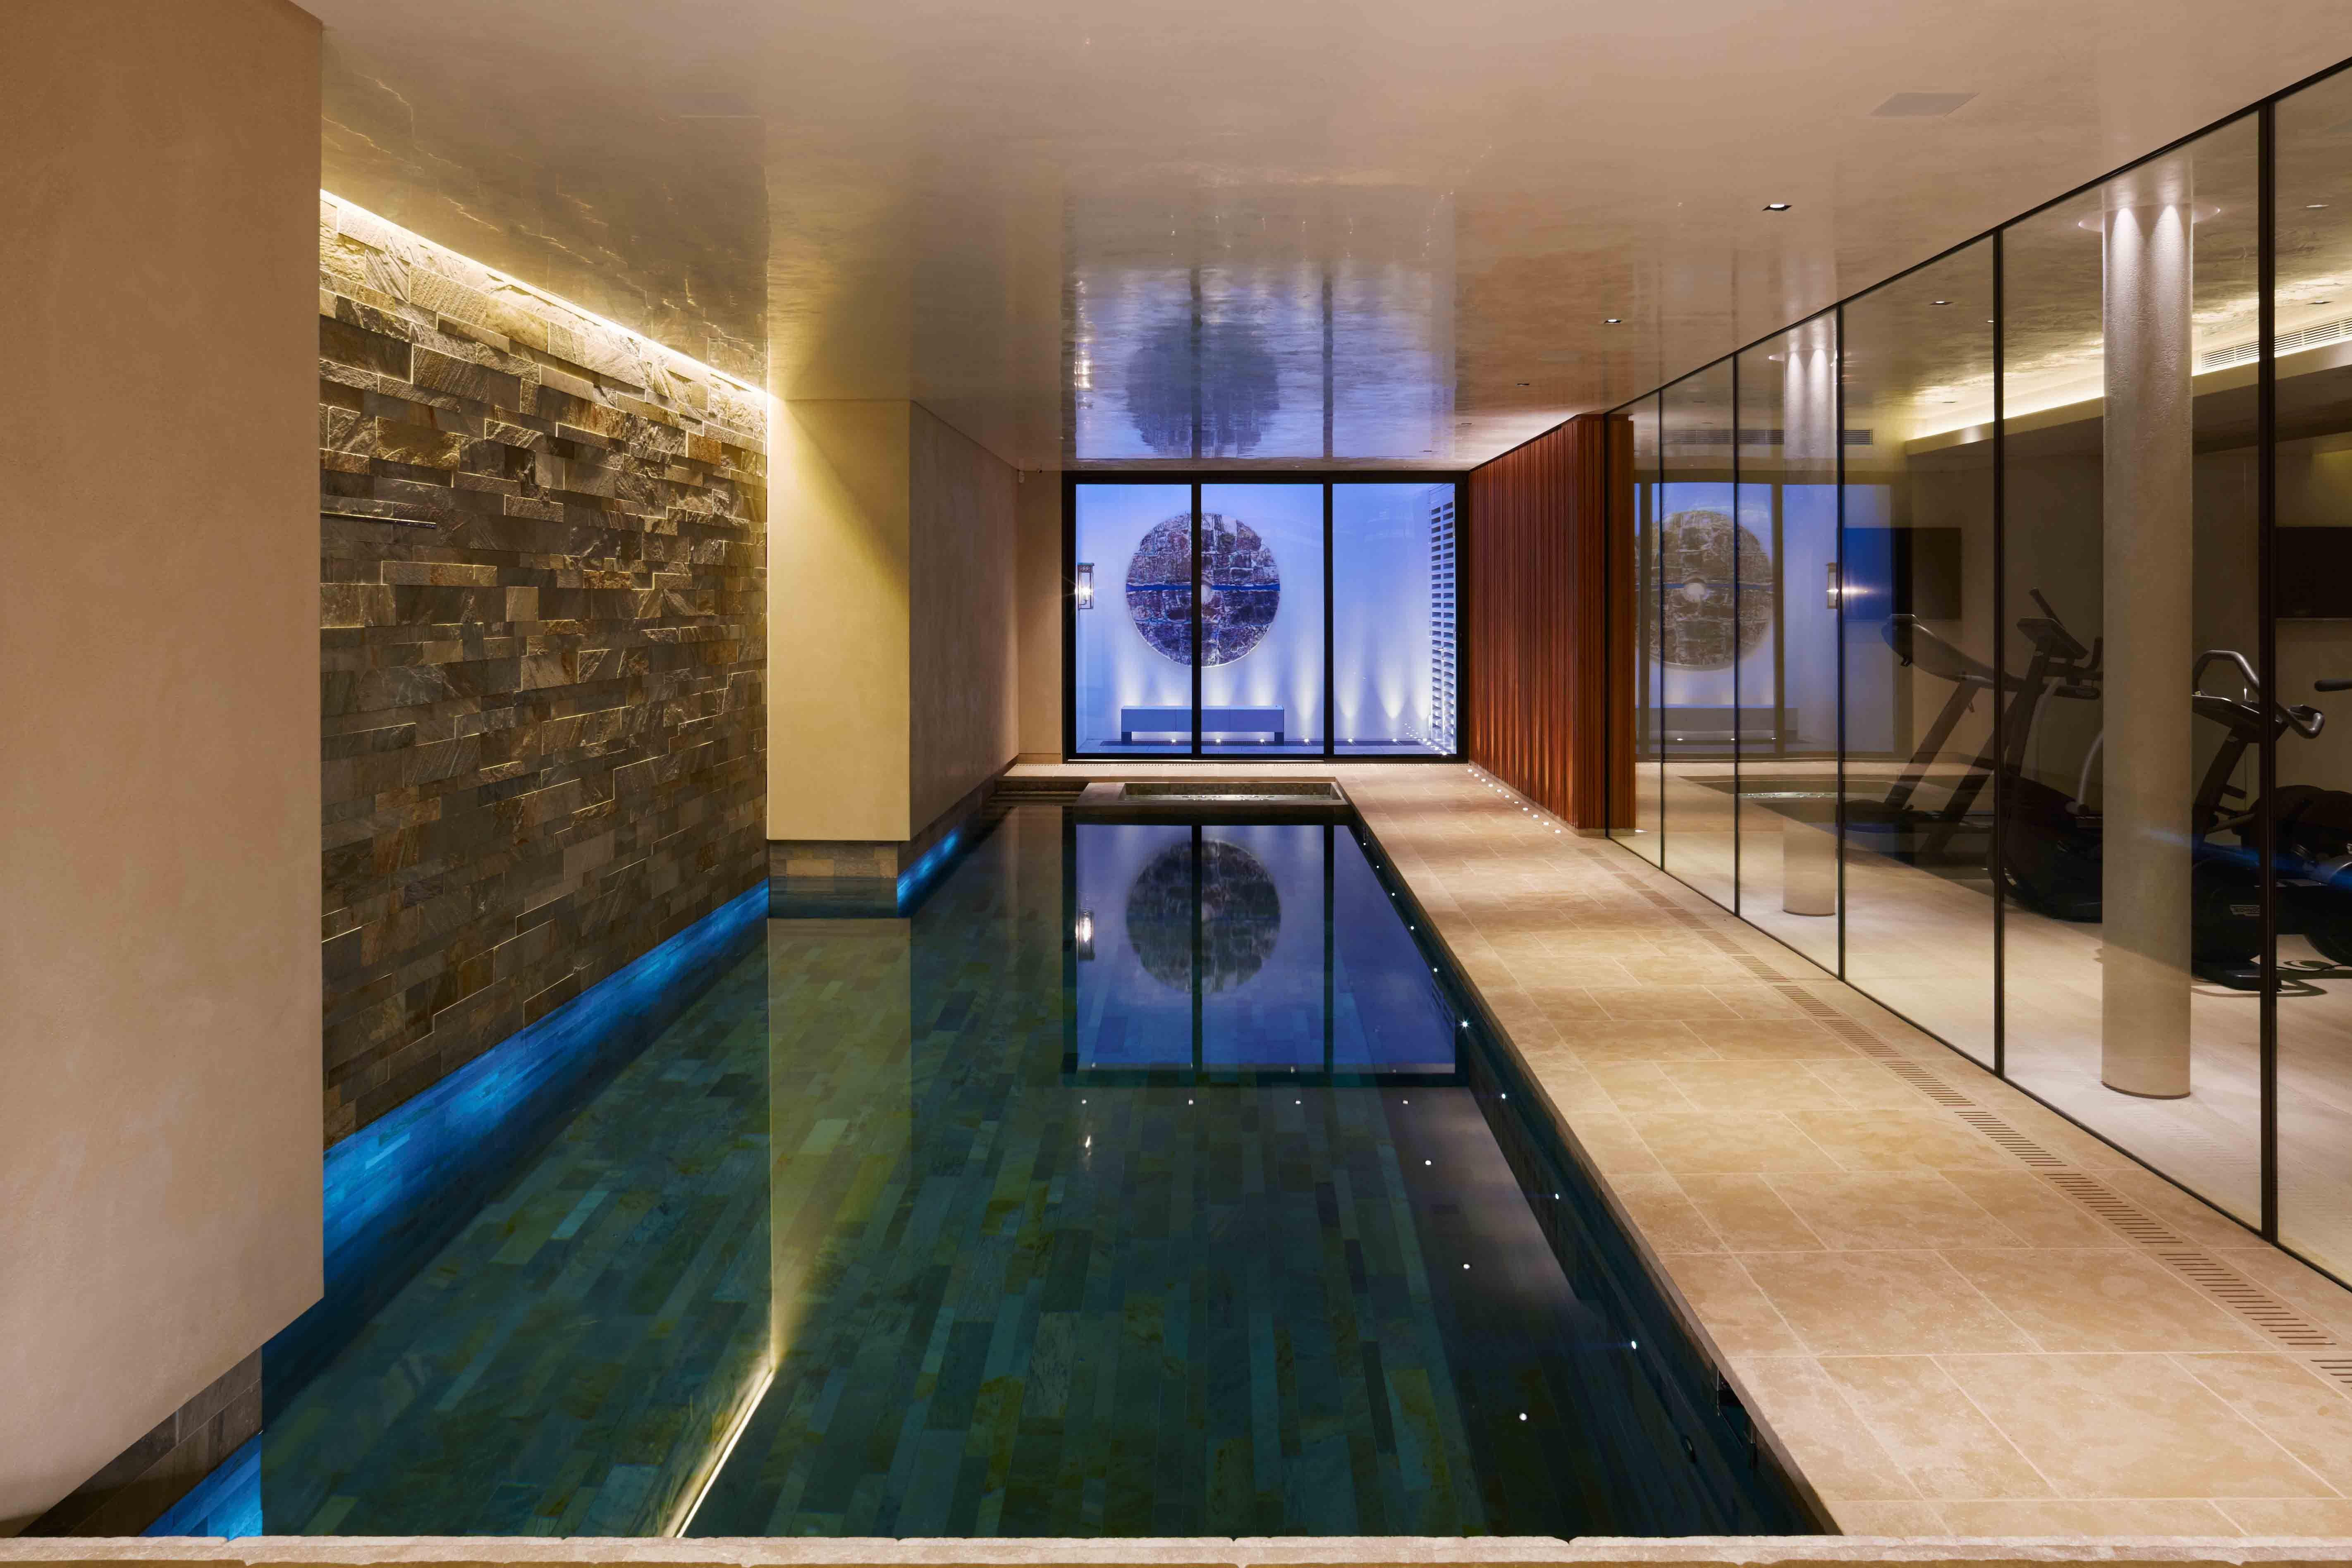 Swimming Pool Lighting Design By John Cullen Lighting